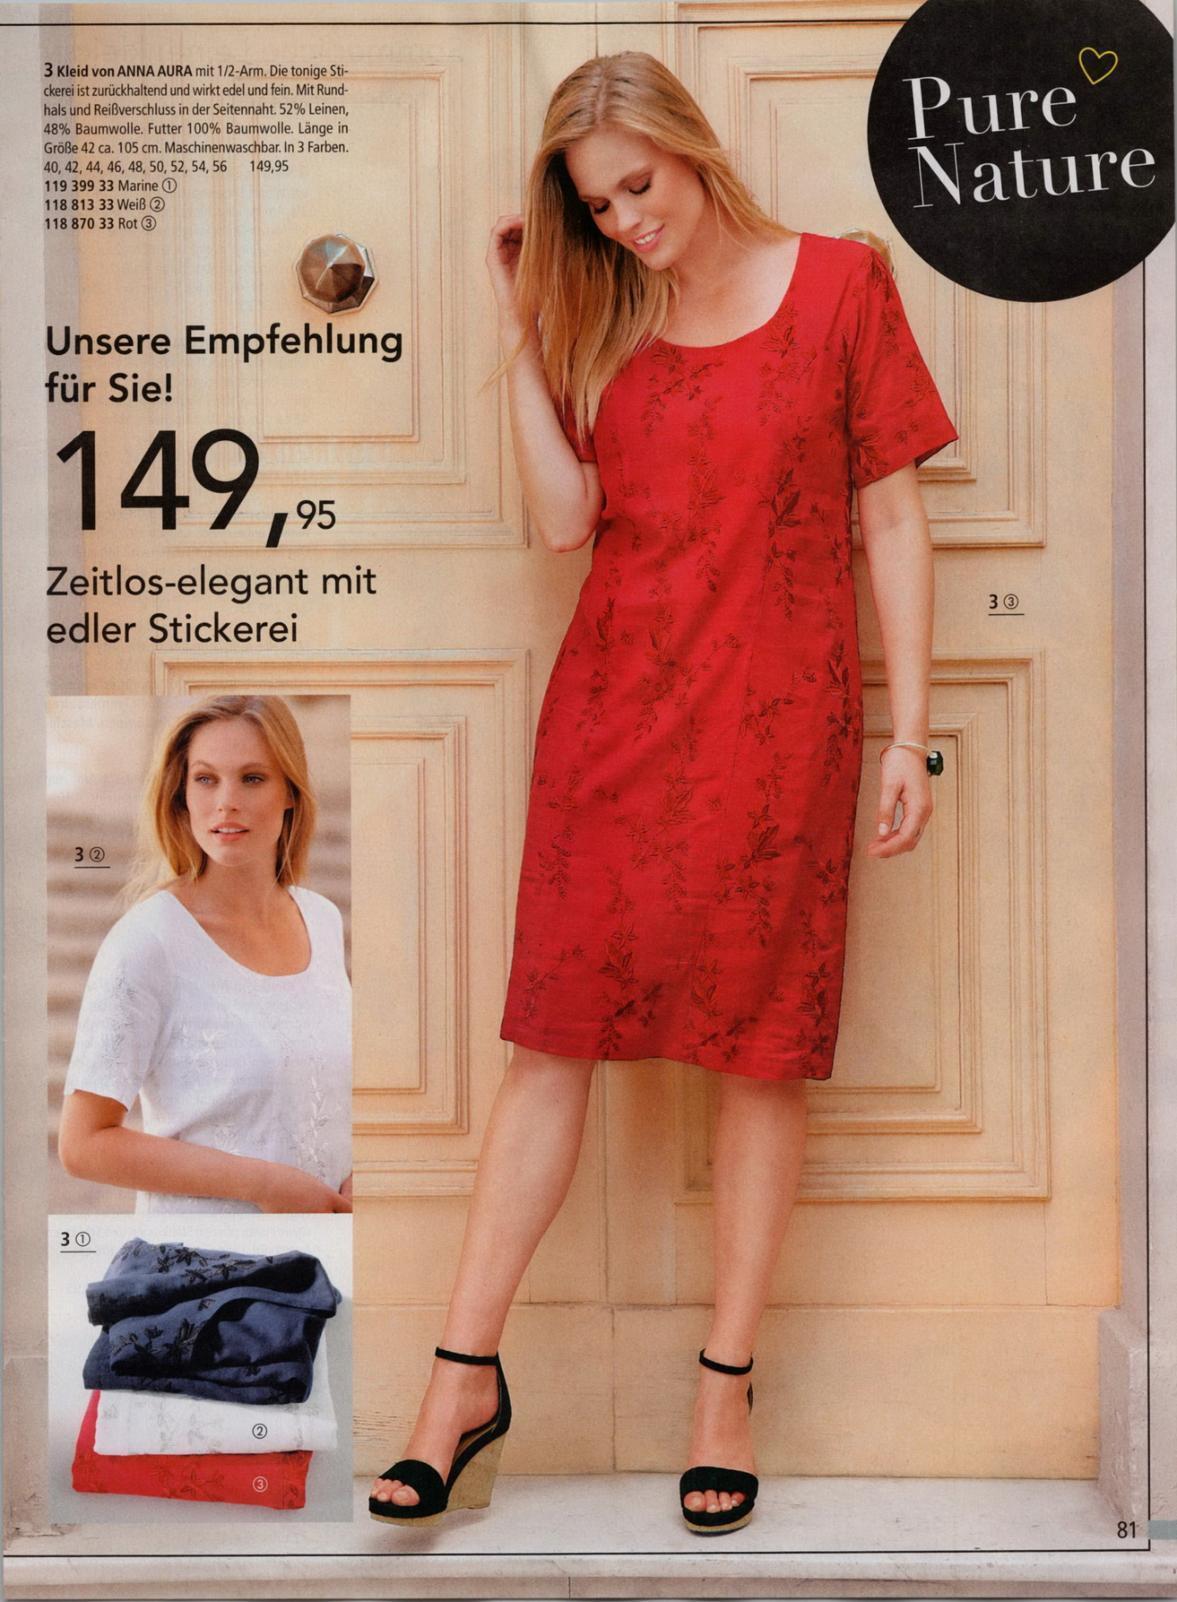 Genial Elegante Kleider Größe 46 Bester Preis13 Großartig Elegante Kleider Größe 46 Boutique